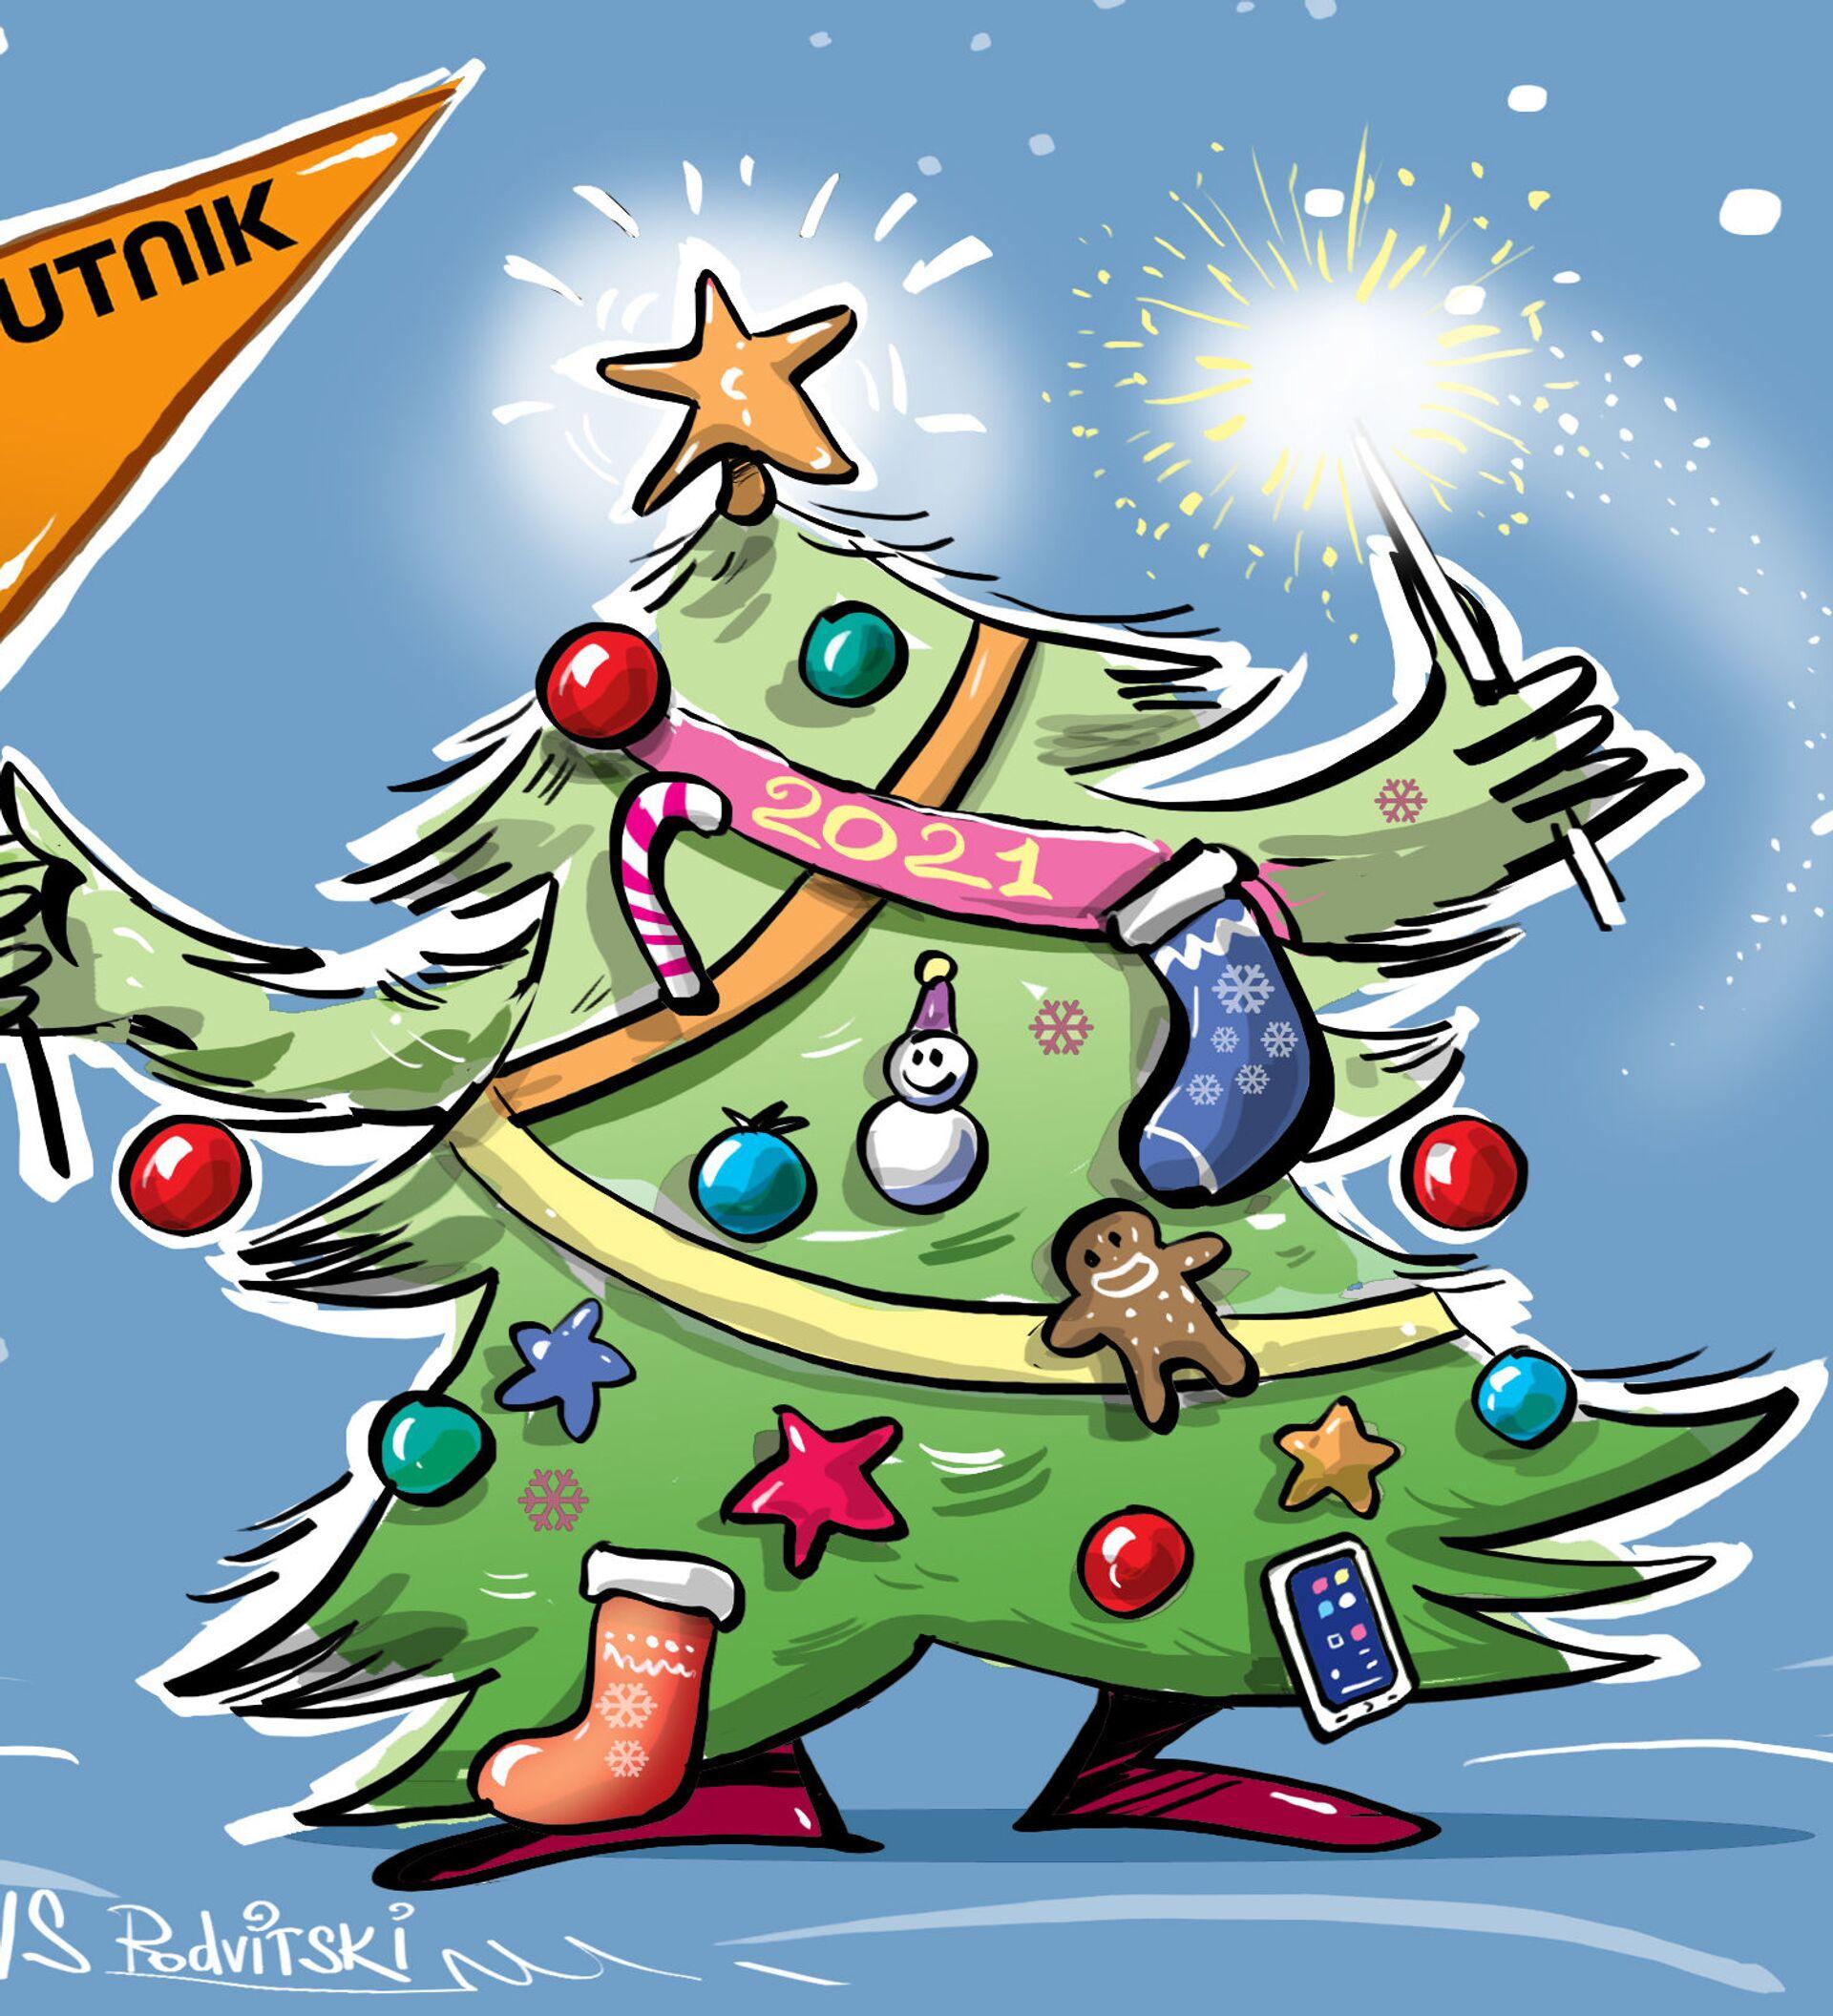 Buon Natale Italia.Buon Natale Da Sputnik Italia 24 12 2020 Sputnik Italia